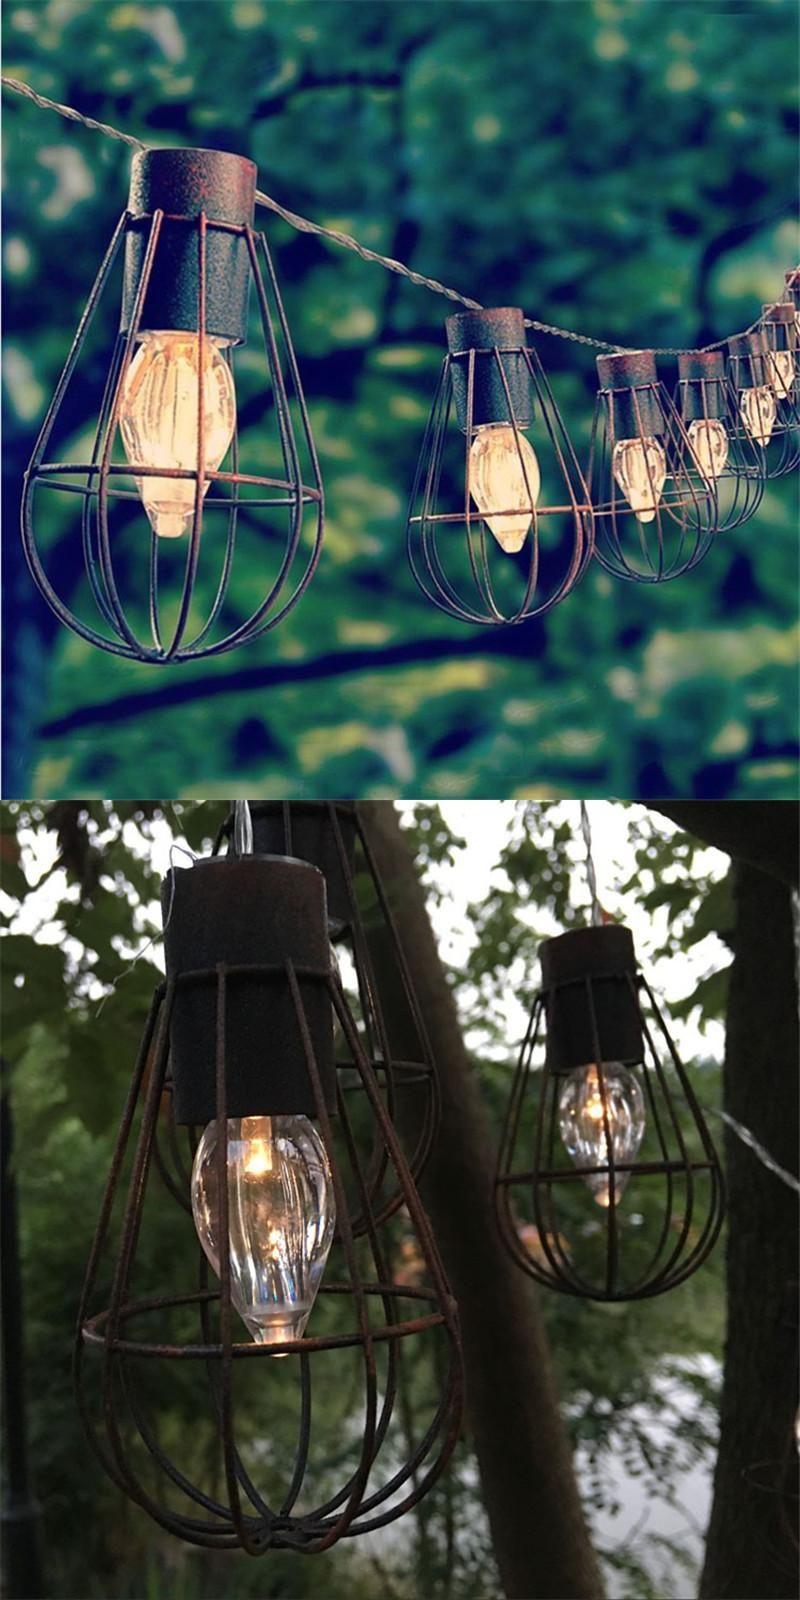 decorative solar lighting. [Visit To Buy] Led Solar Garden Light Lampe Solaire Decorative Metal String Lights 10led Lighting N